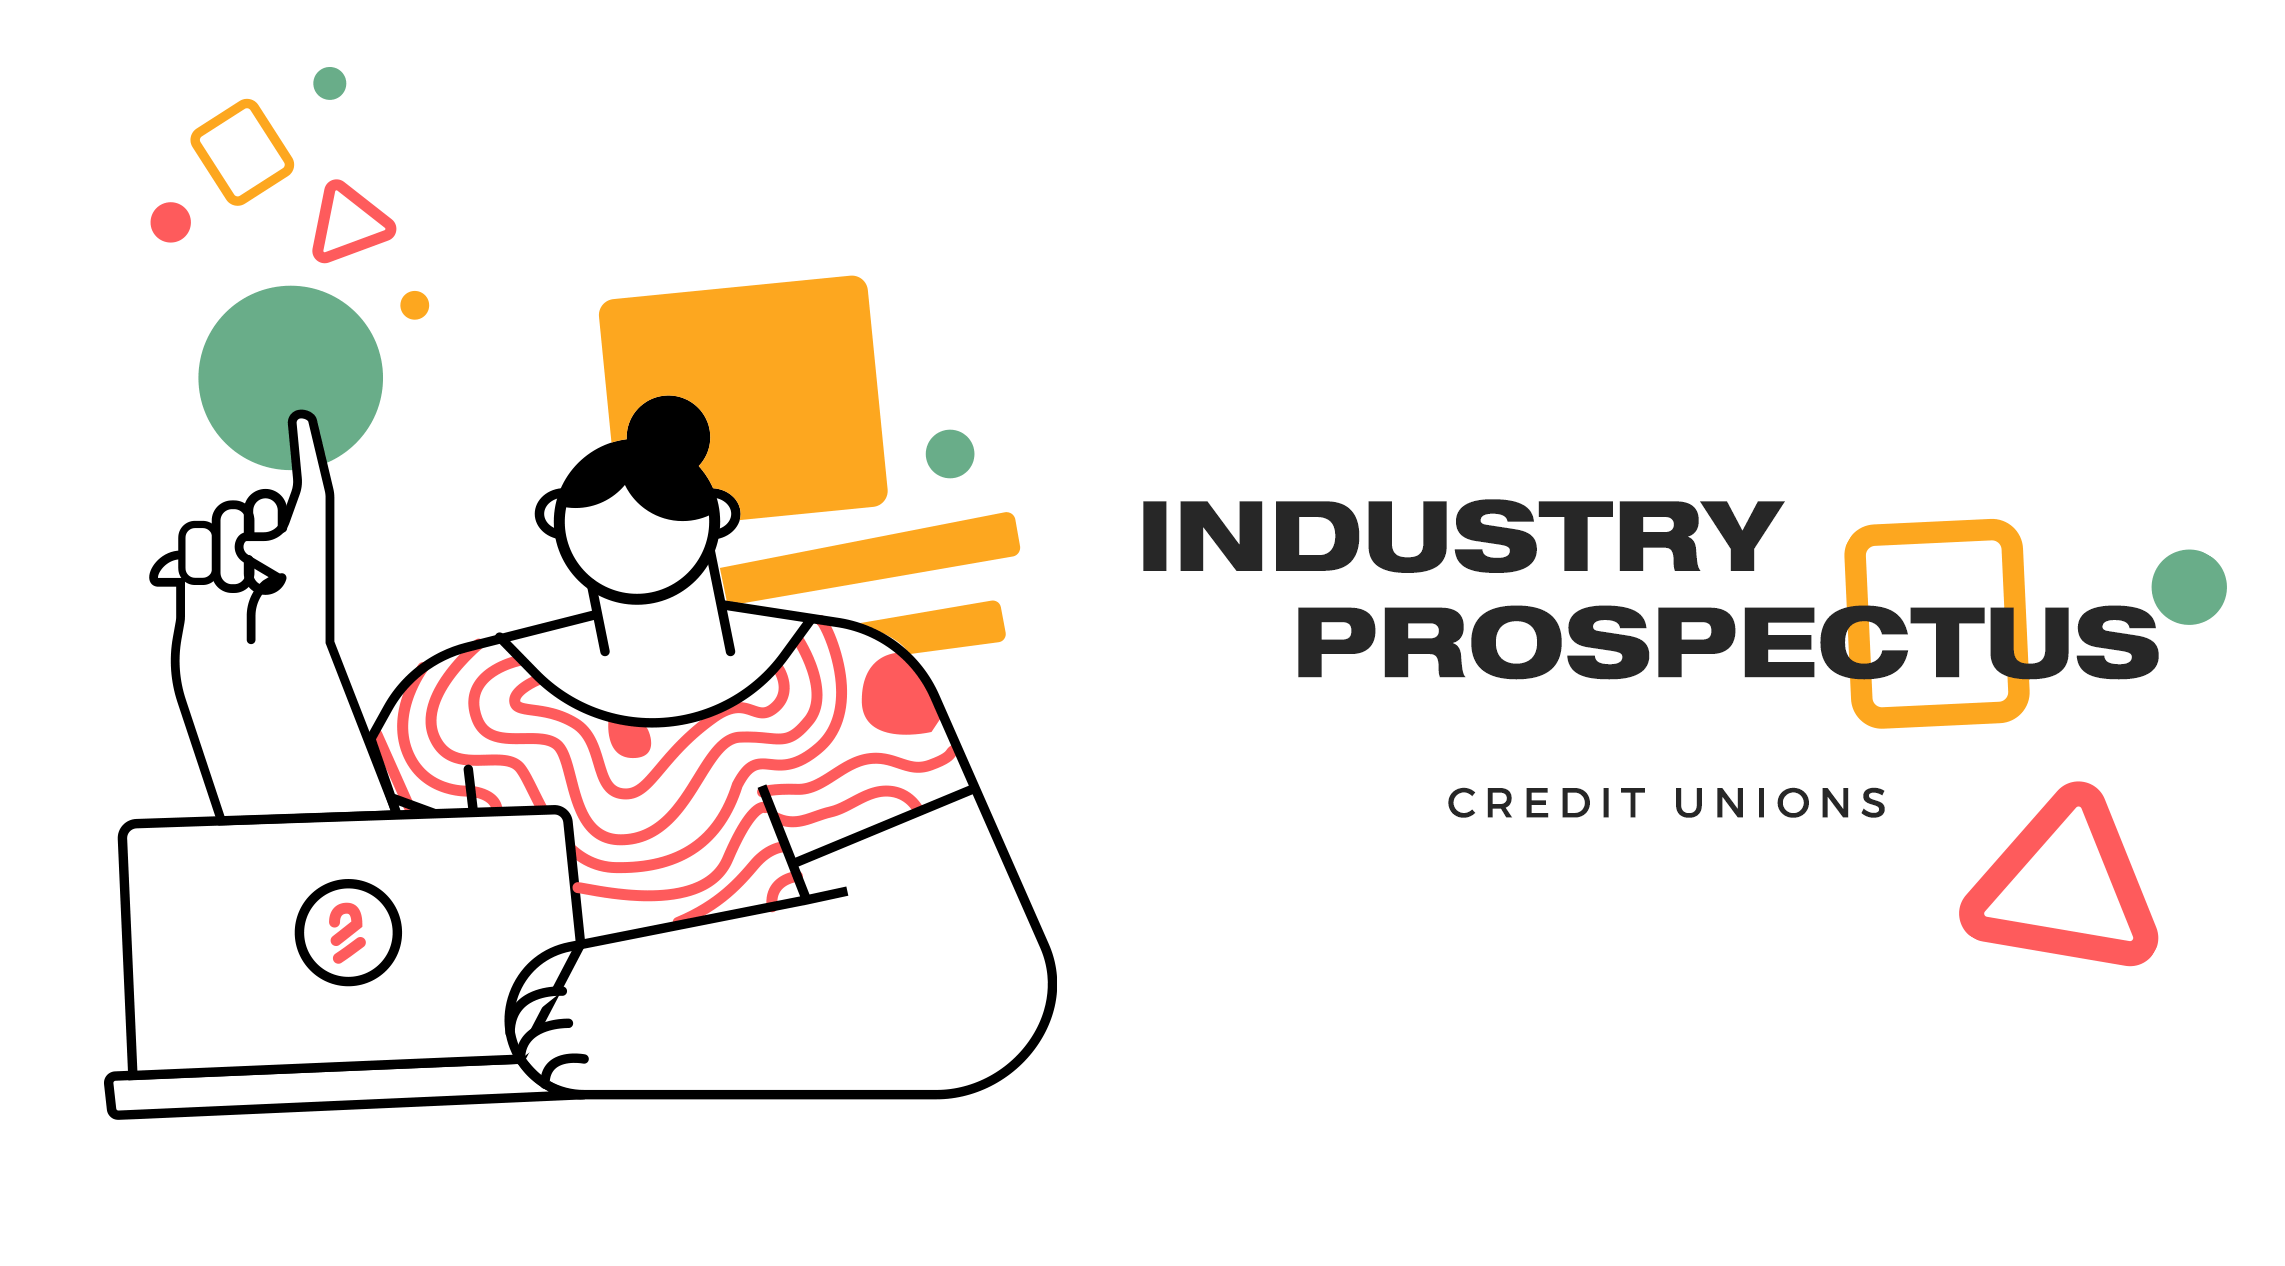 Industry Prospectus - Credit Unions